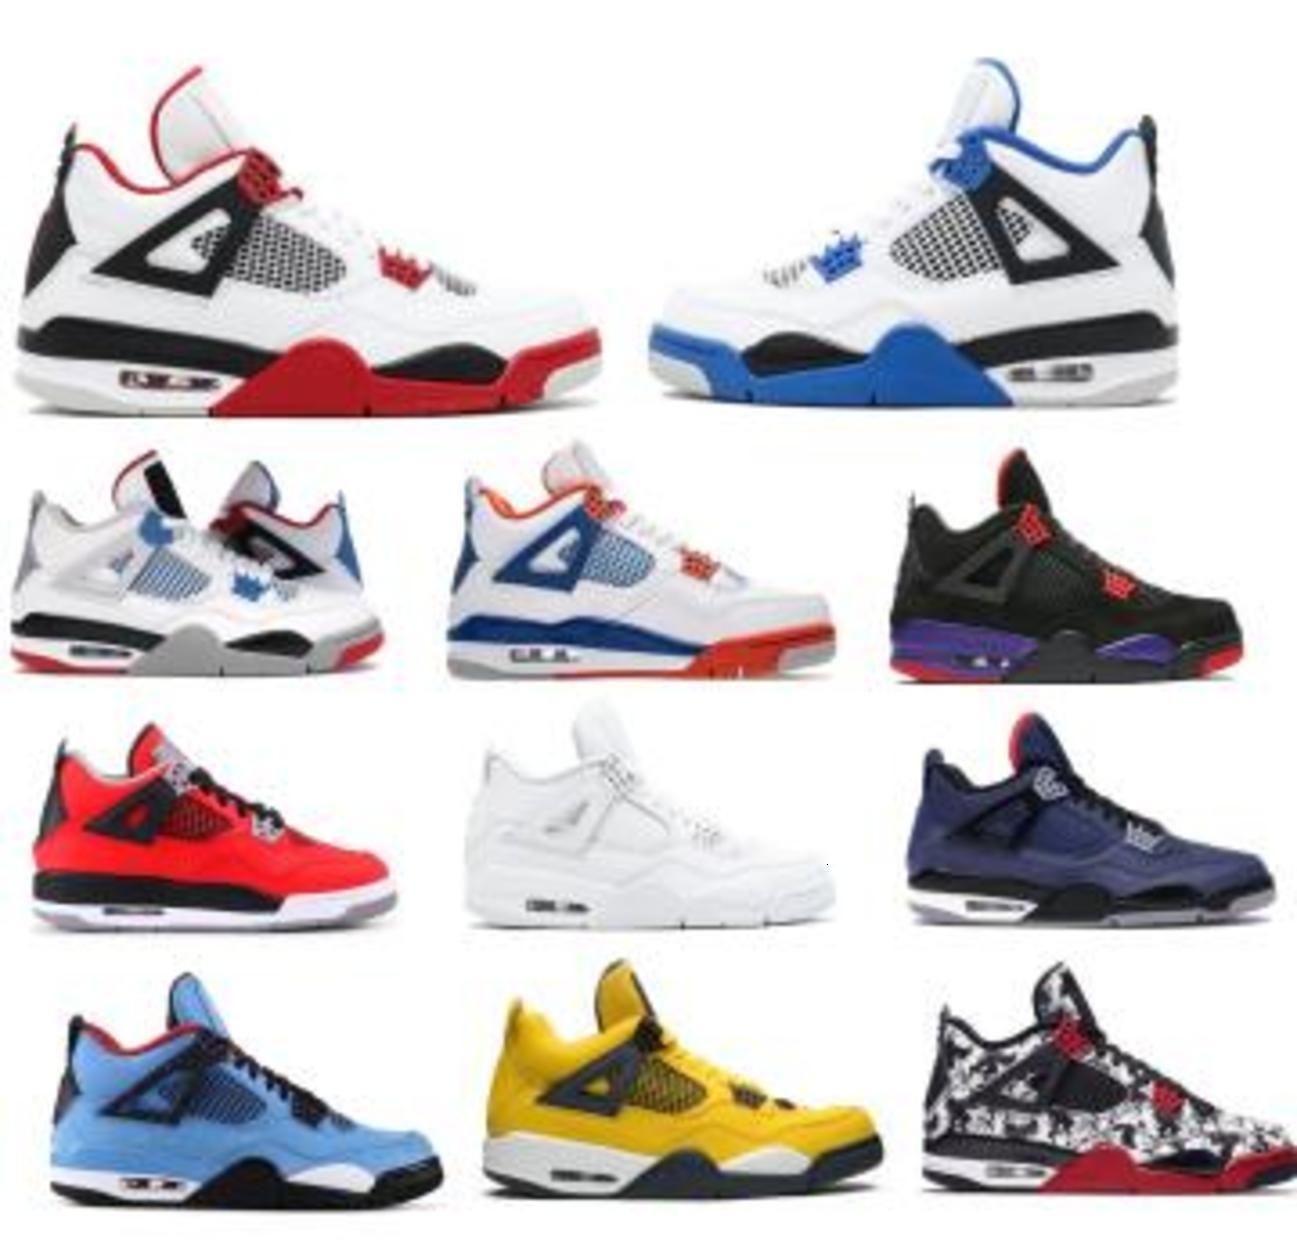 Jumpman 4 Mens Basketball Shoes Motorsports Winterized Loyal What The Raptors Fiba Tattoo Toro Bravo Flight 4s IV 2020 Women Tennis Sneakers